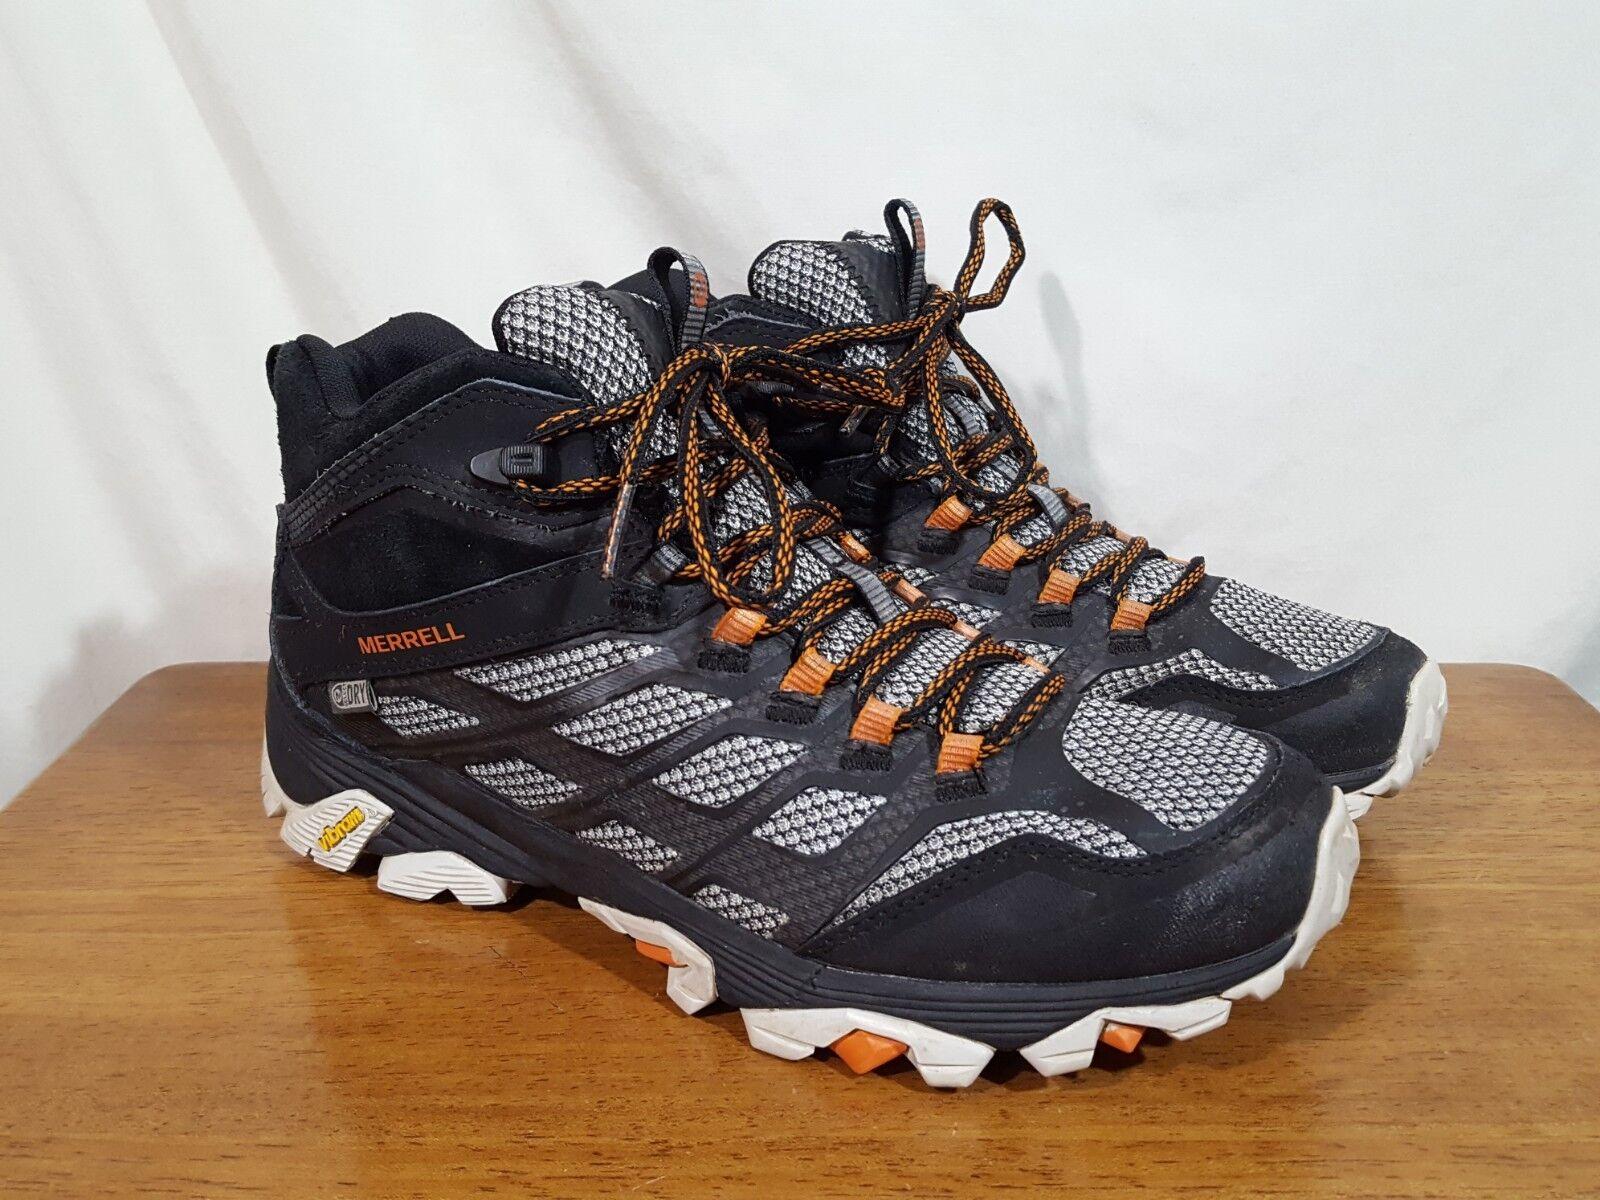 Men's Merrell J35747 Moab FST Mid Waterproof Hiking shoes Boots - Size 7.5